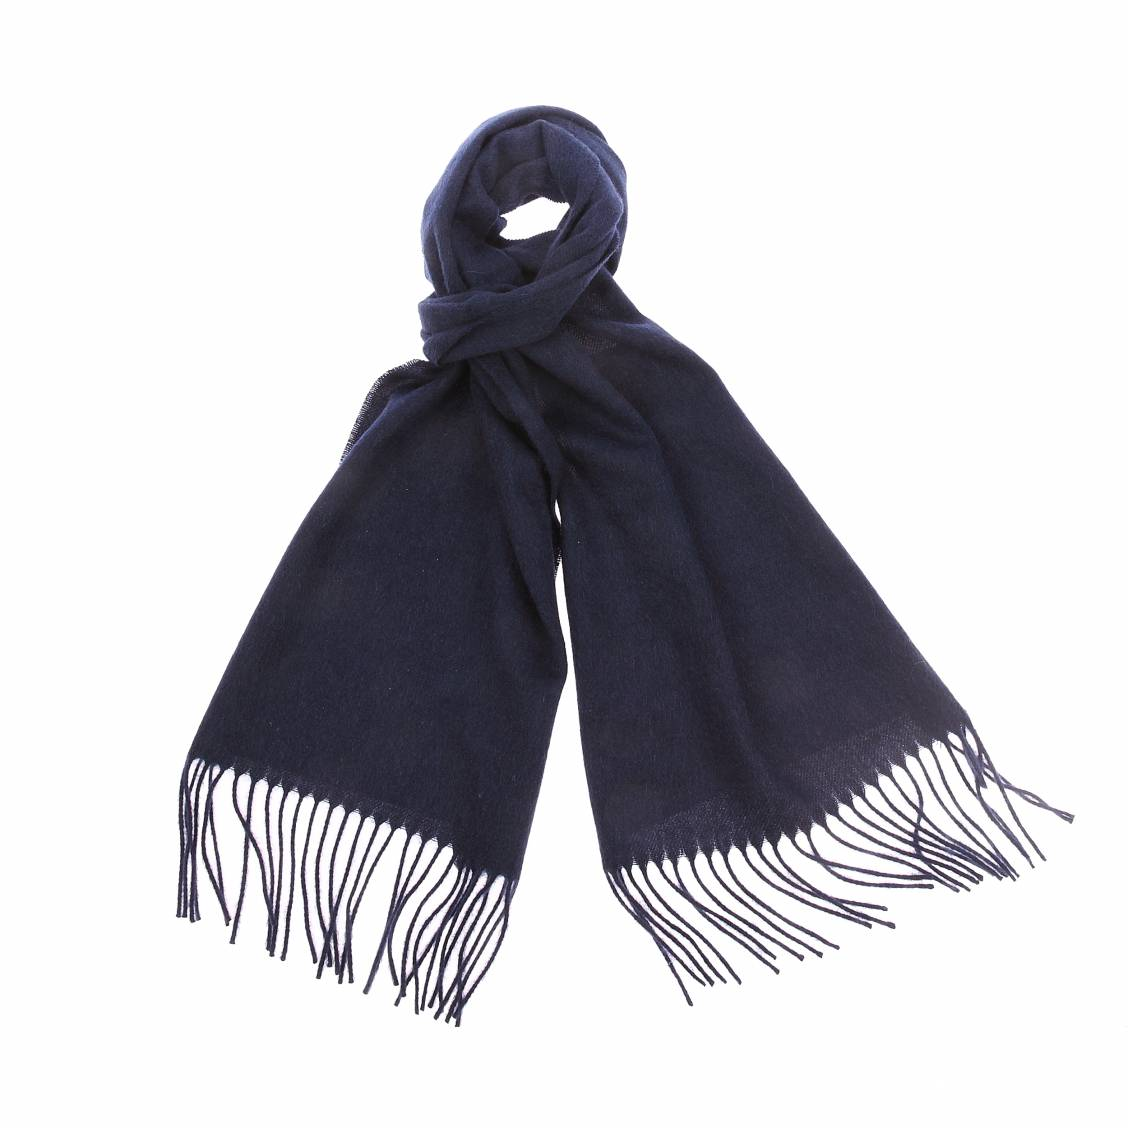 Echarpe jean chatel en laine bleu marine